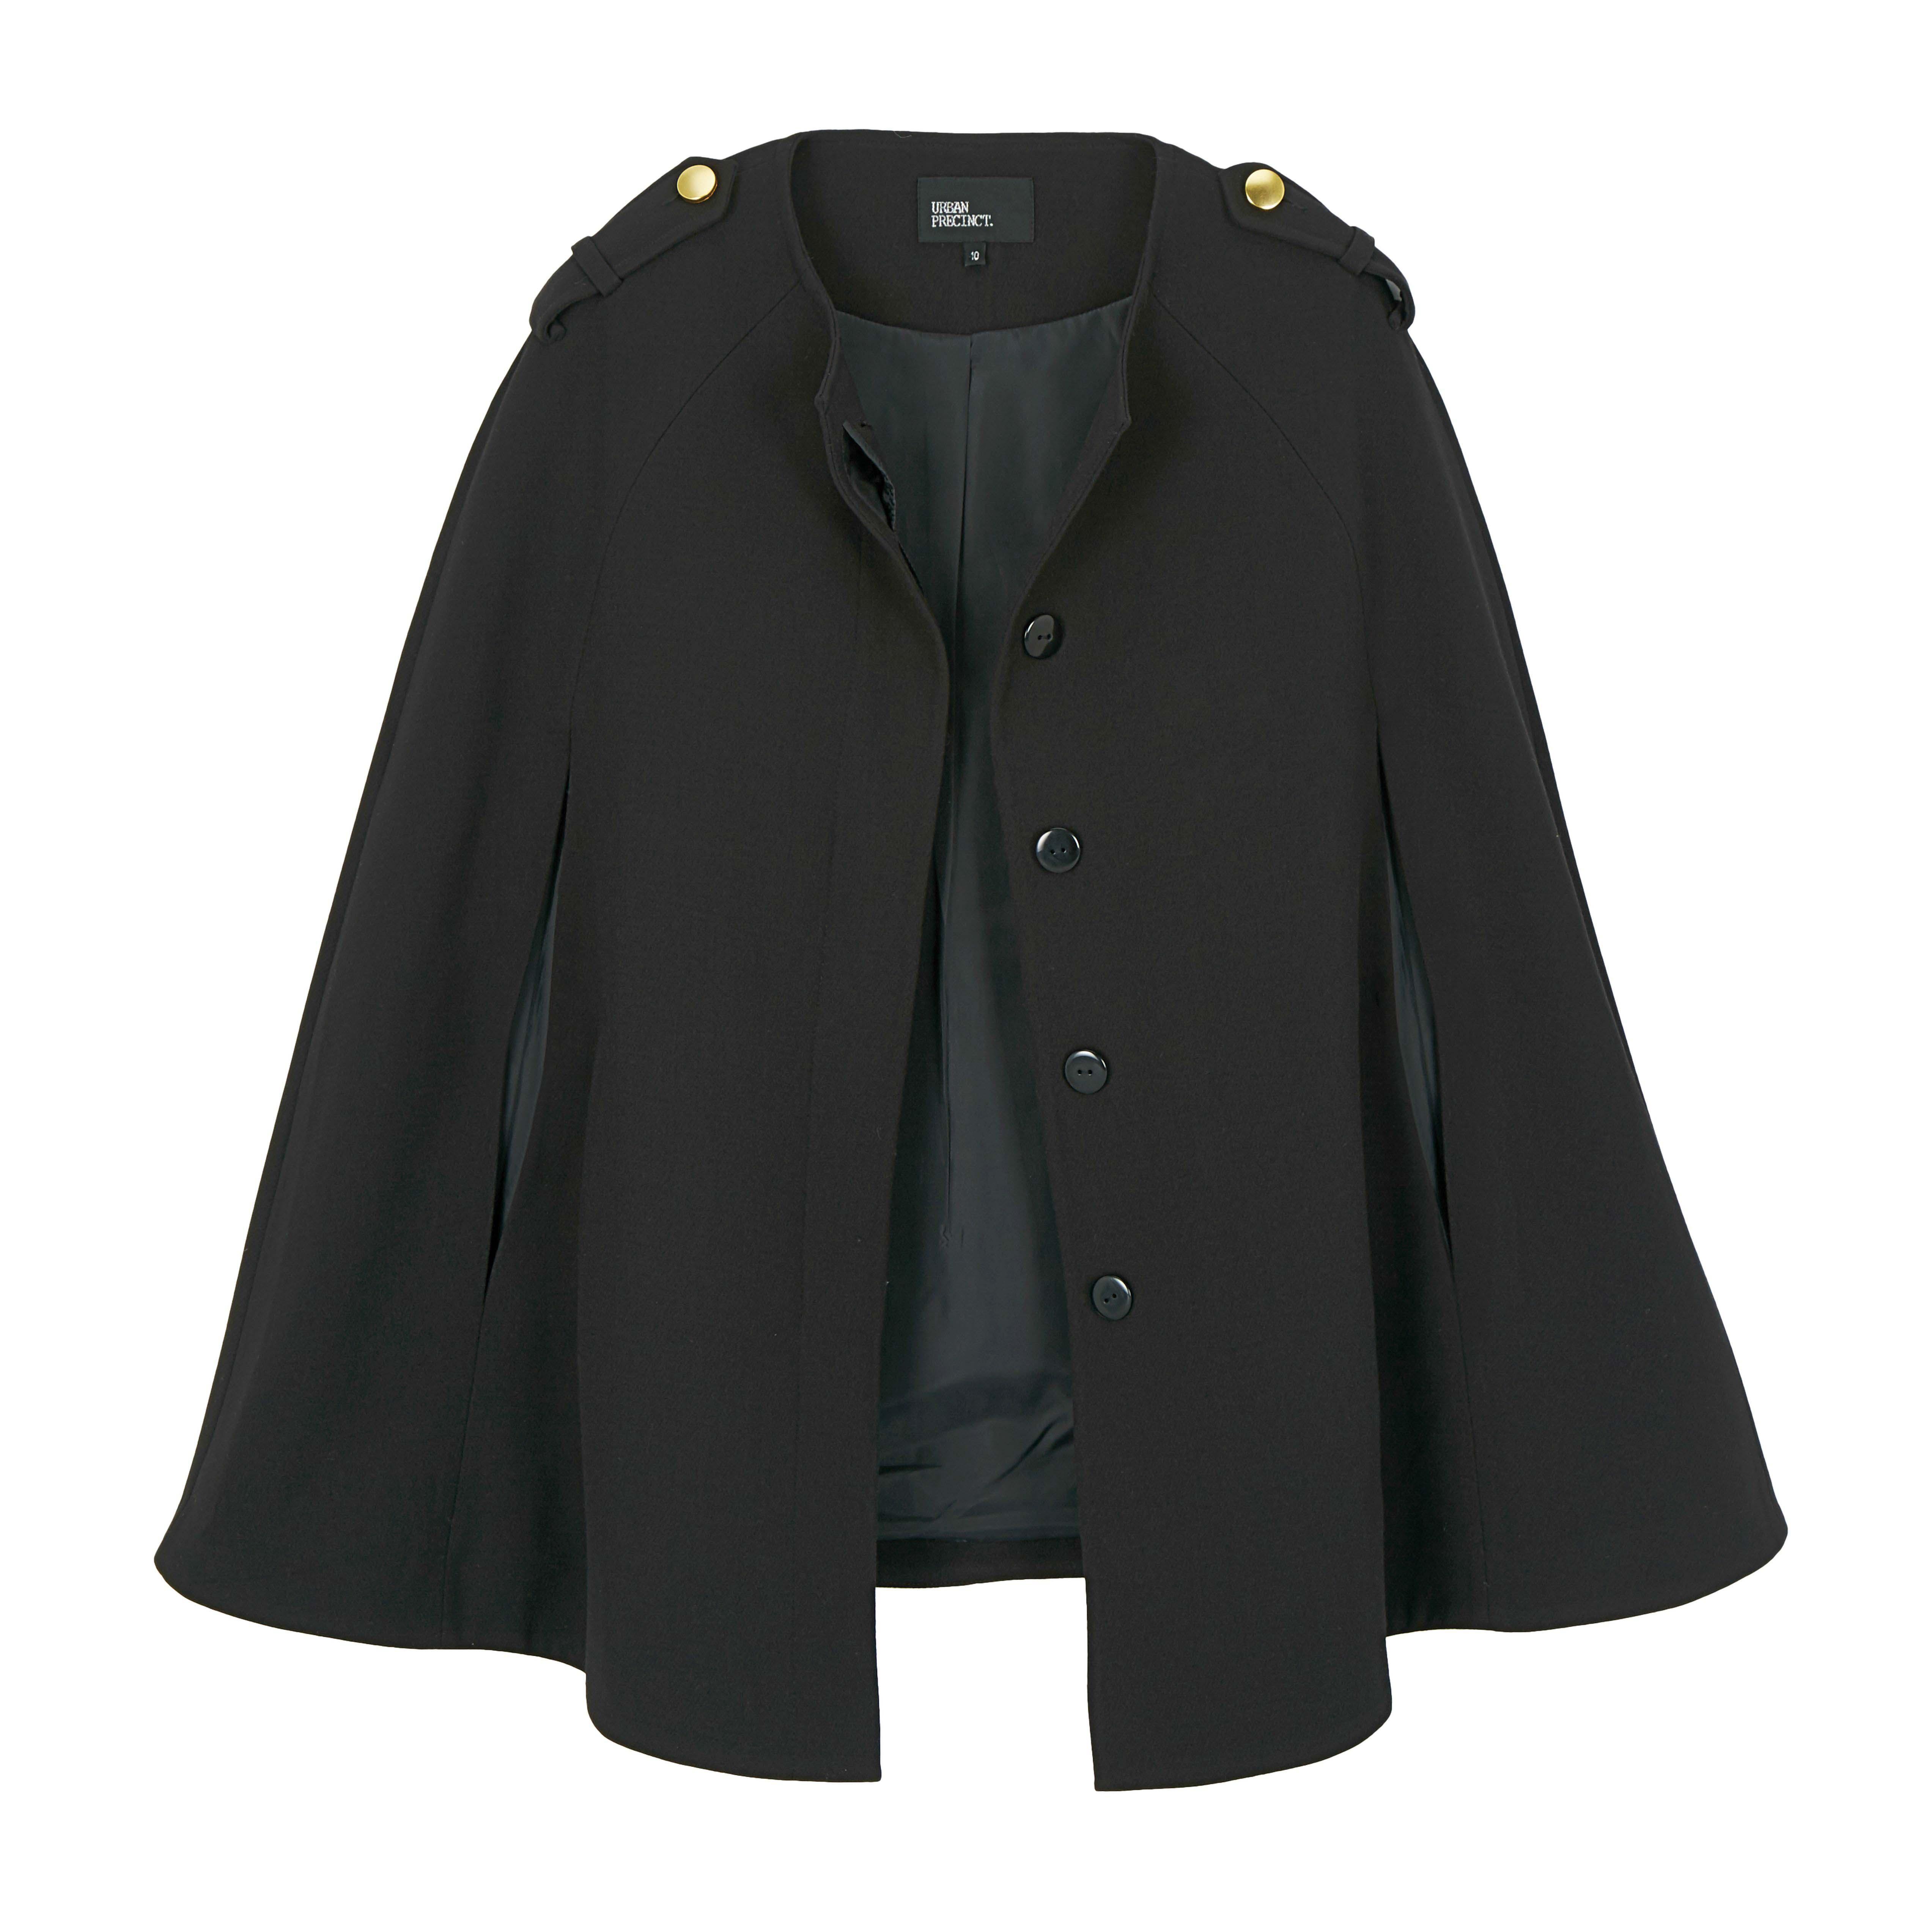 6091380 Urban Precinct Black Cape Coat $119.99 Instore March 21 2016